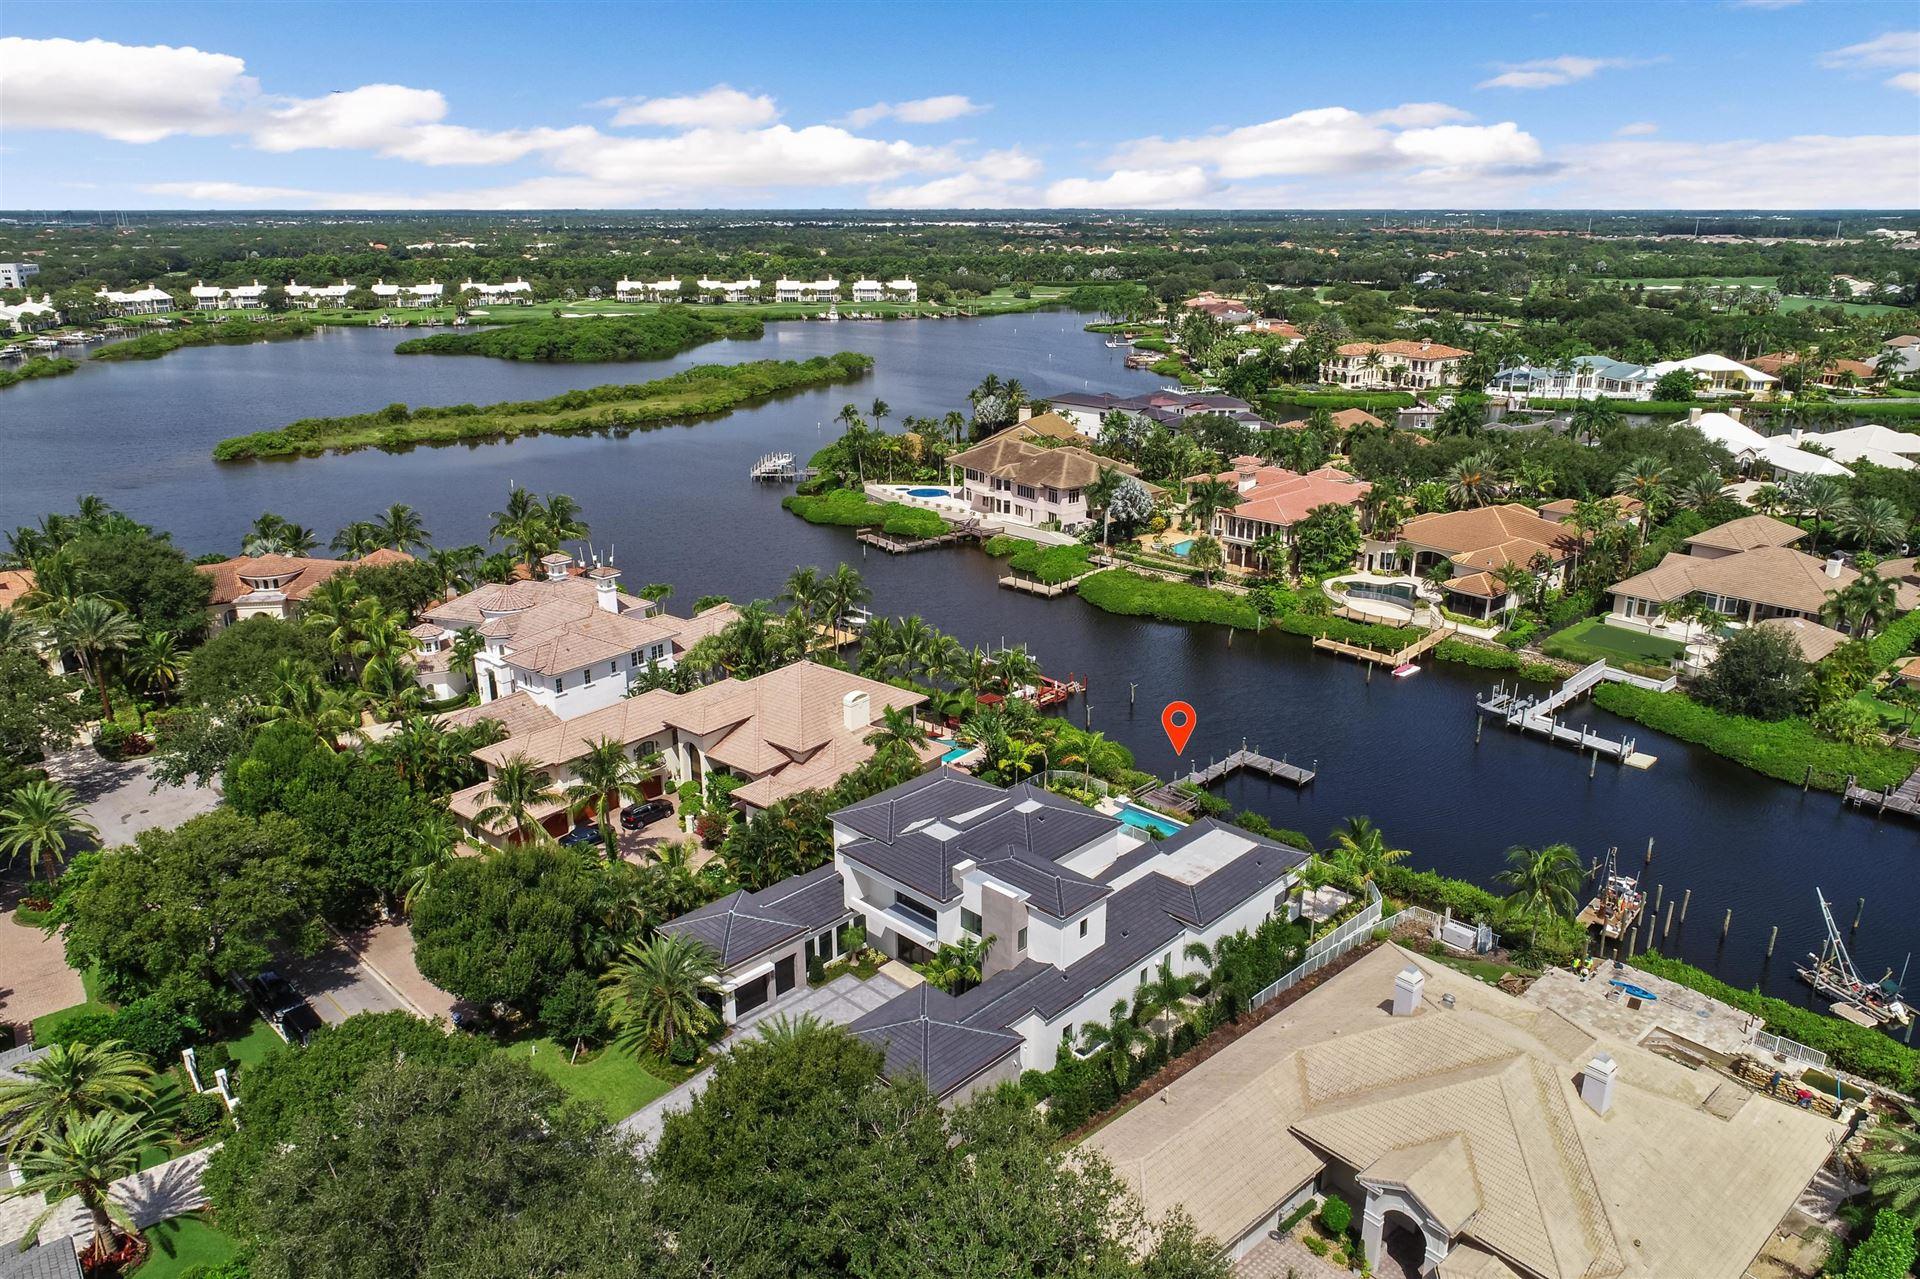 Photo of 130 Quayside Drive, Jupiter, FL 33477 (MLS # RX-10682166)